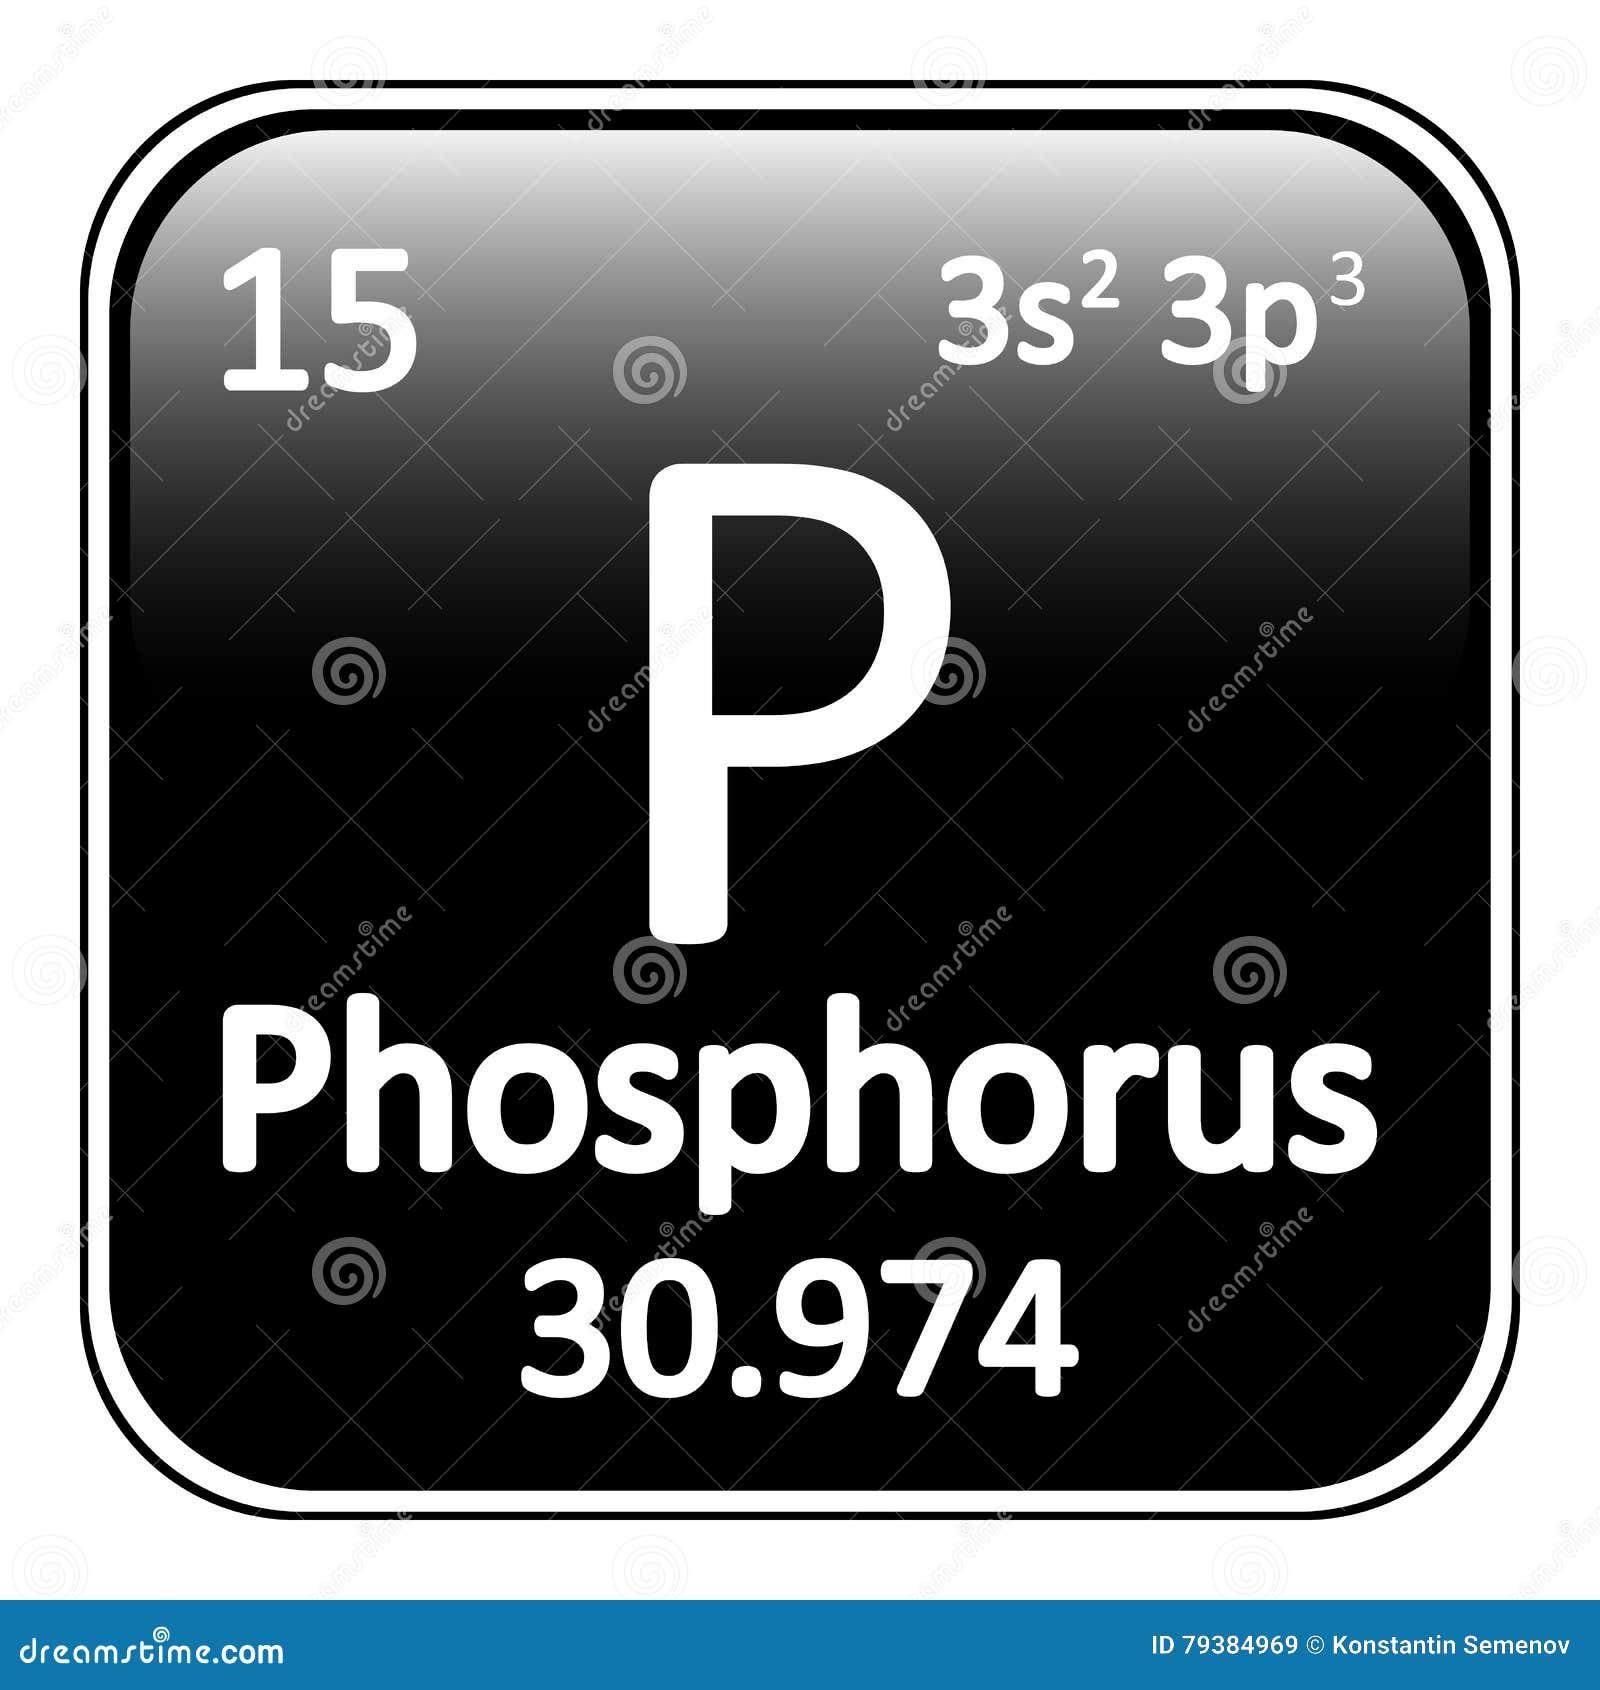 Periodic table element phosphorus icon stock illustration image periodic table element phosphorus icon gamestrikefo Gallery